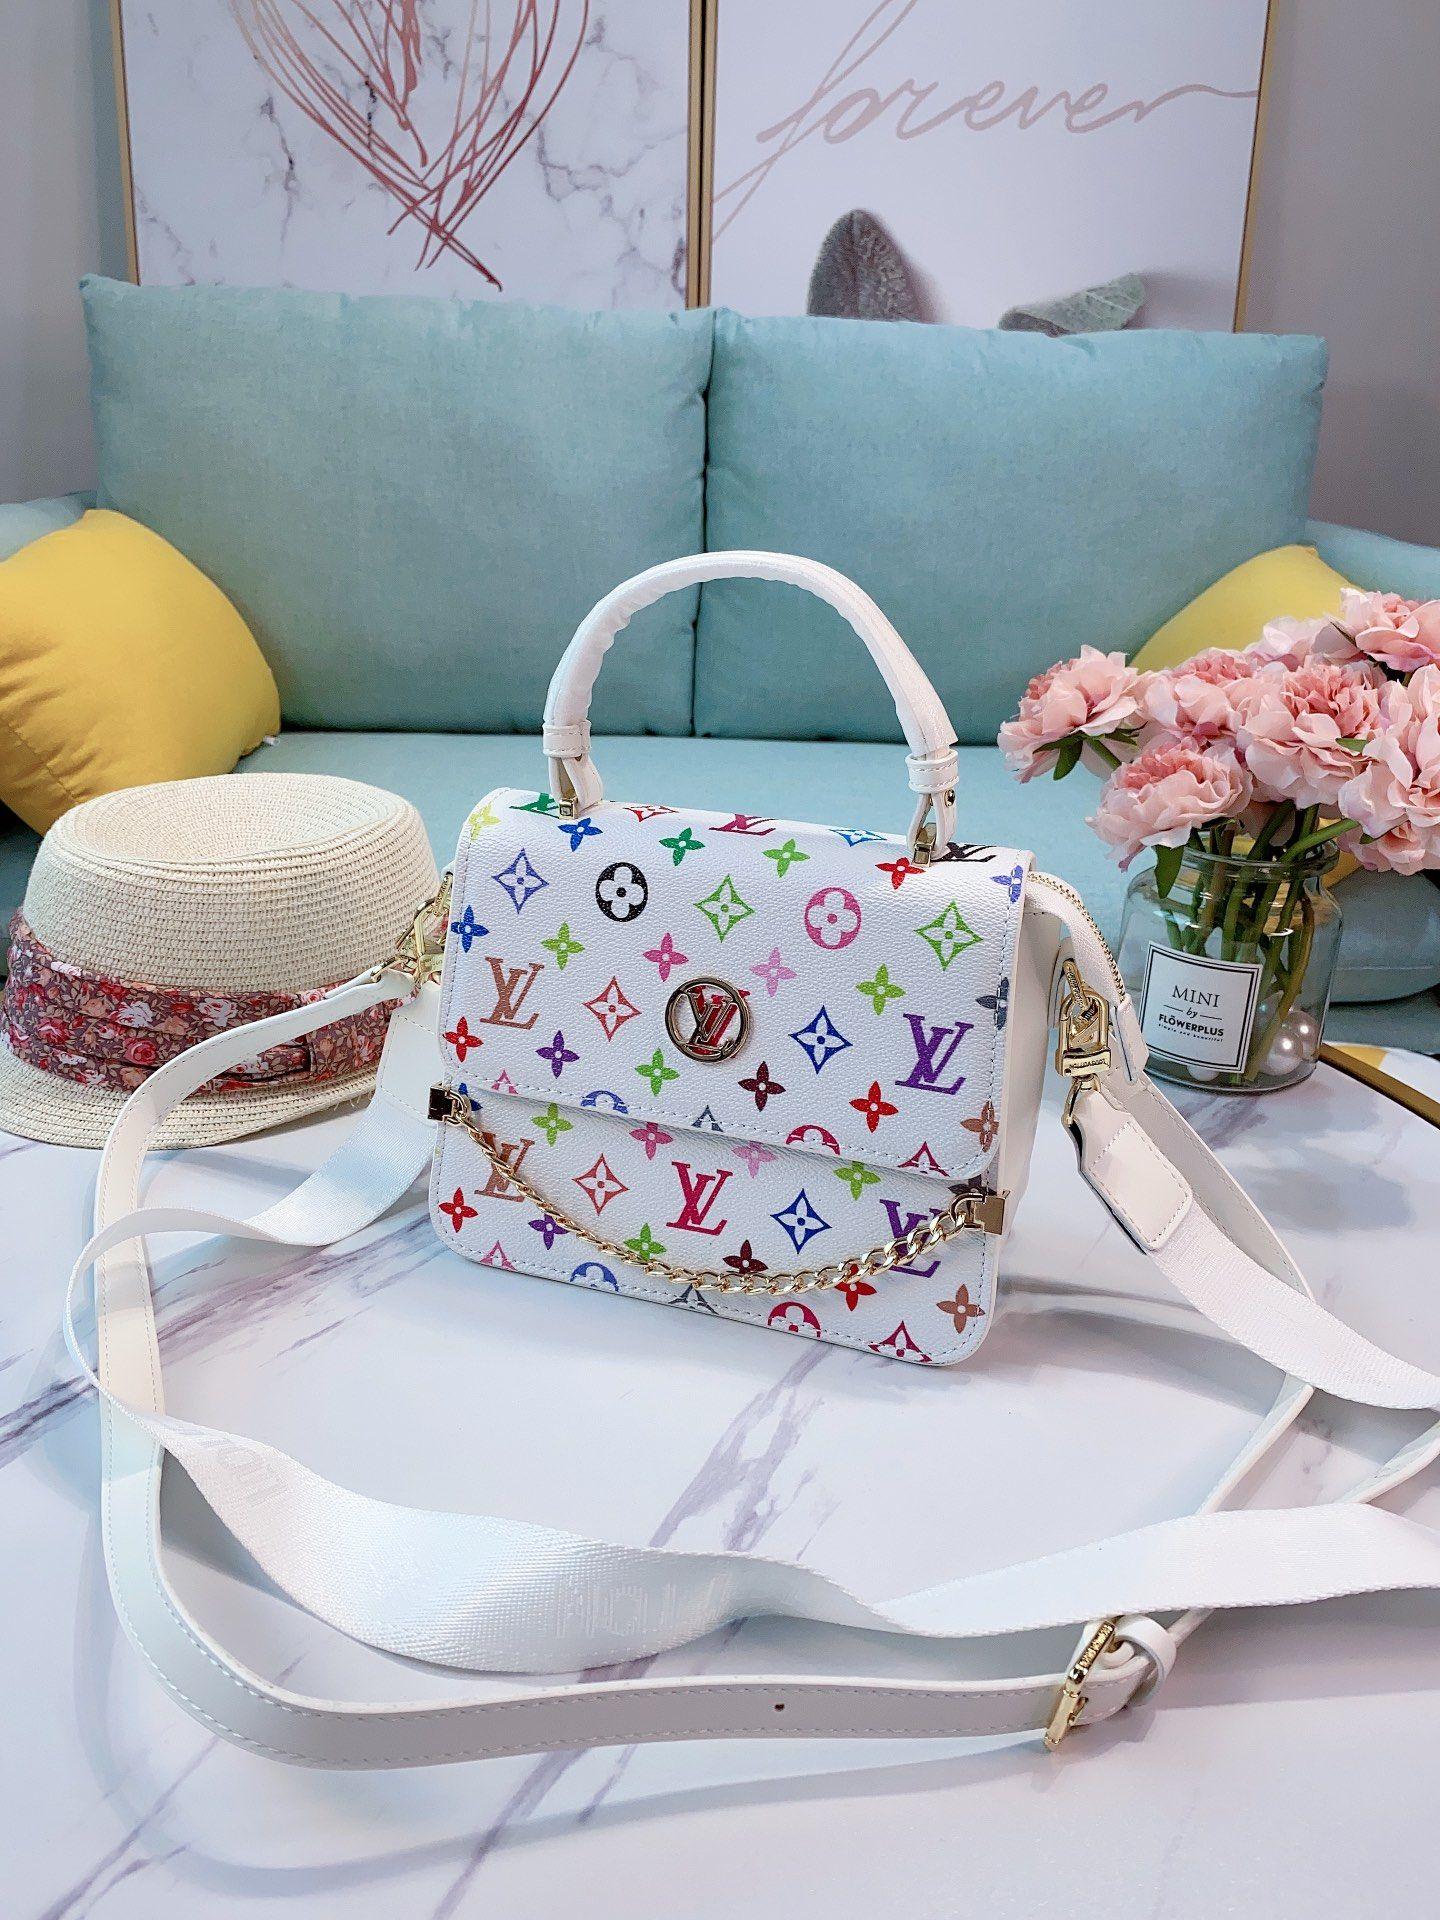 Top qualidade bolsas de grife bolsas bolsas de grife de luxo designer bolsas de luxo embreagem tote bolsas de couro bolsa de ombro NB320